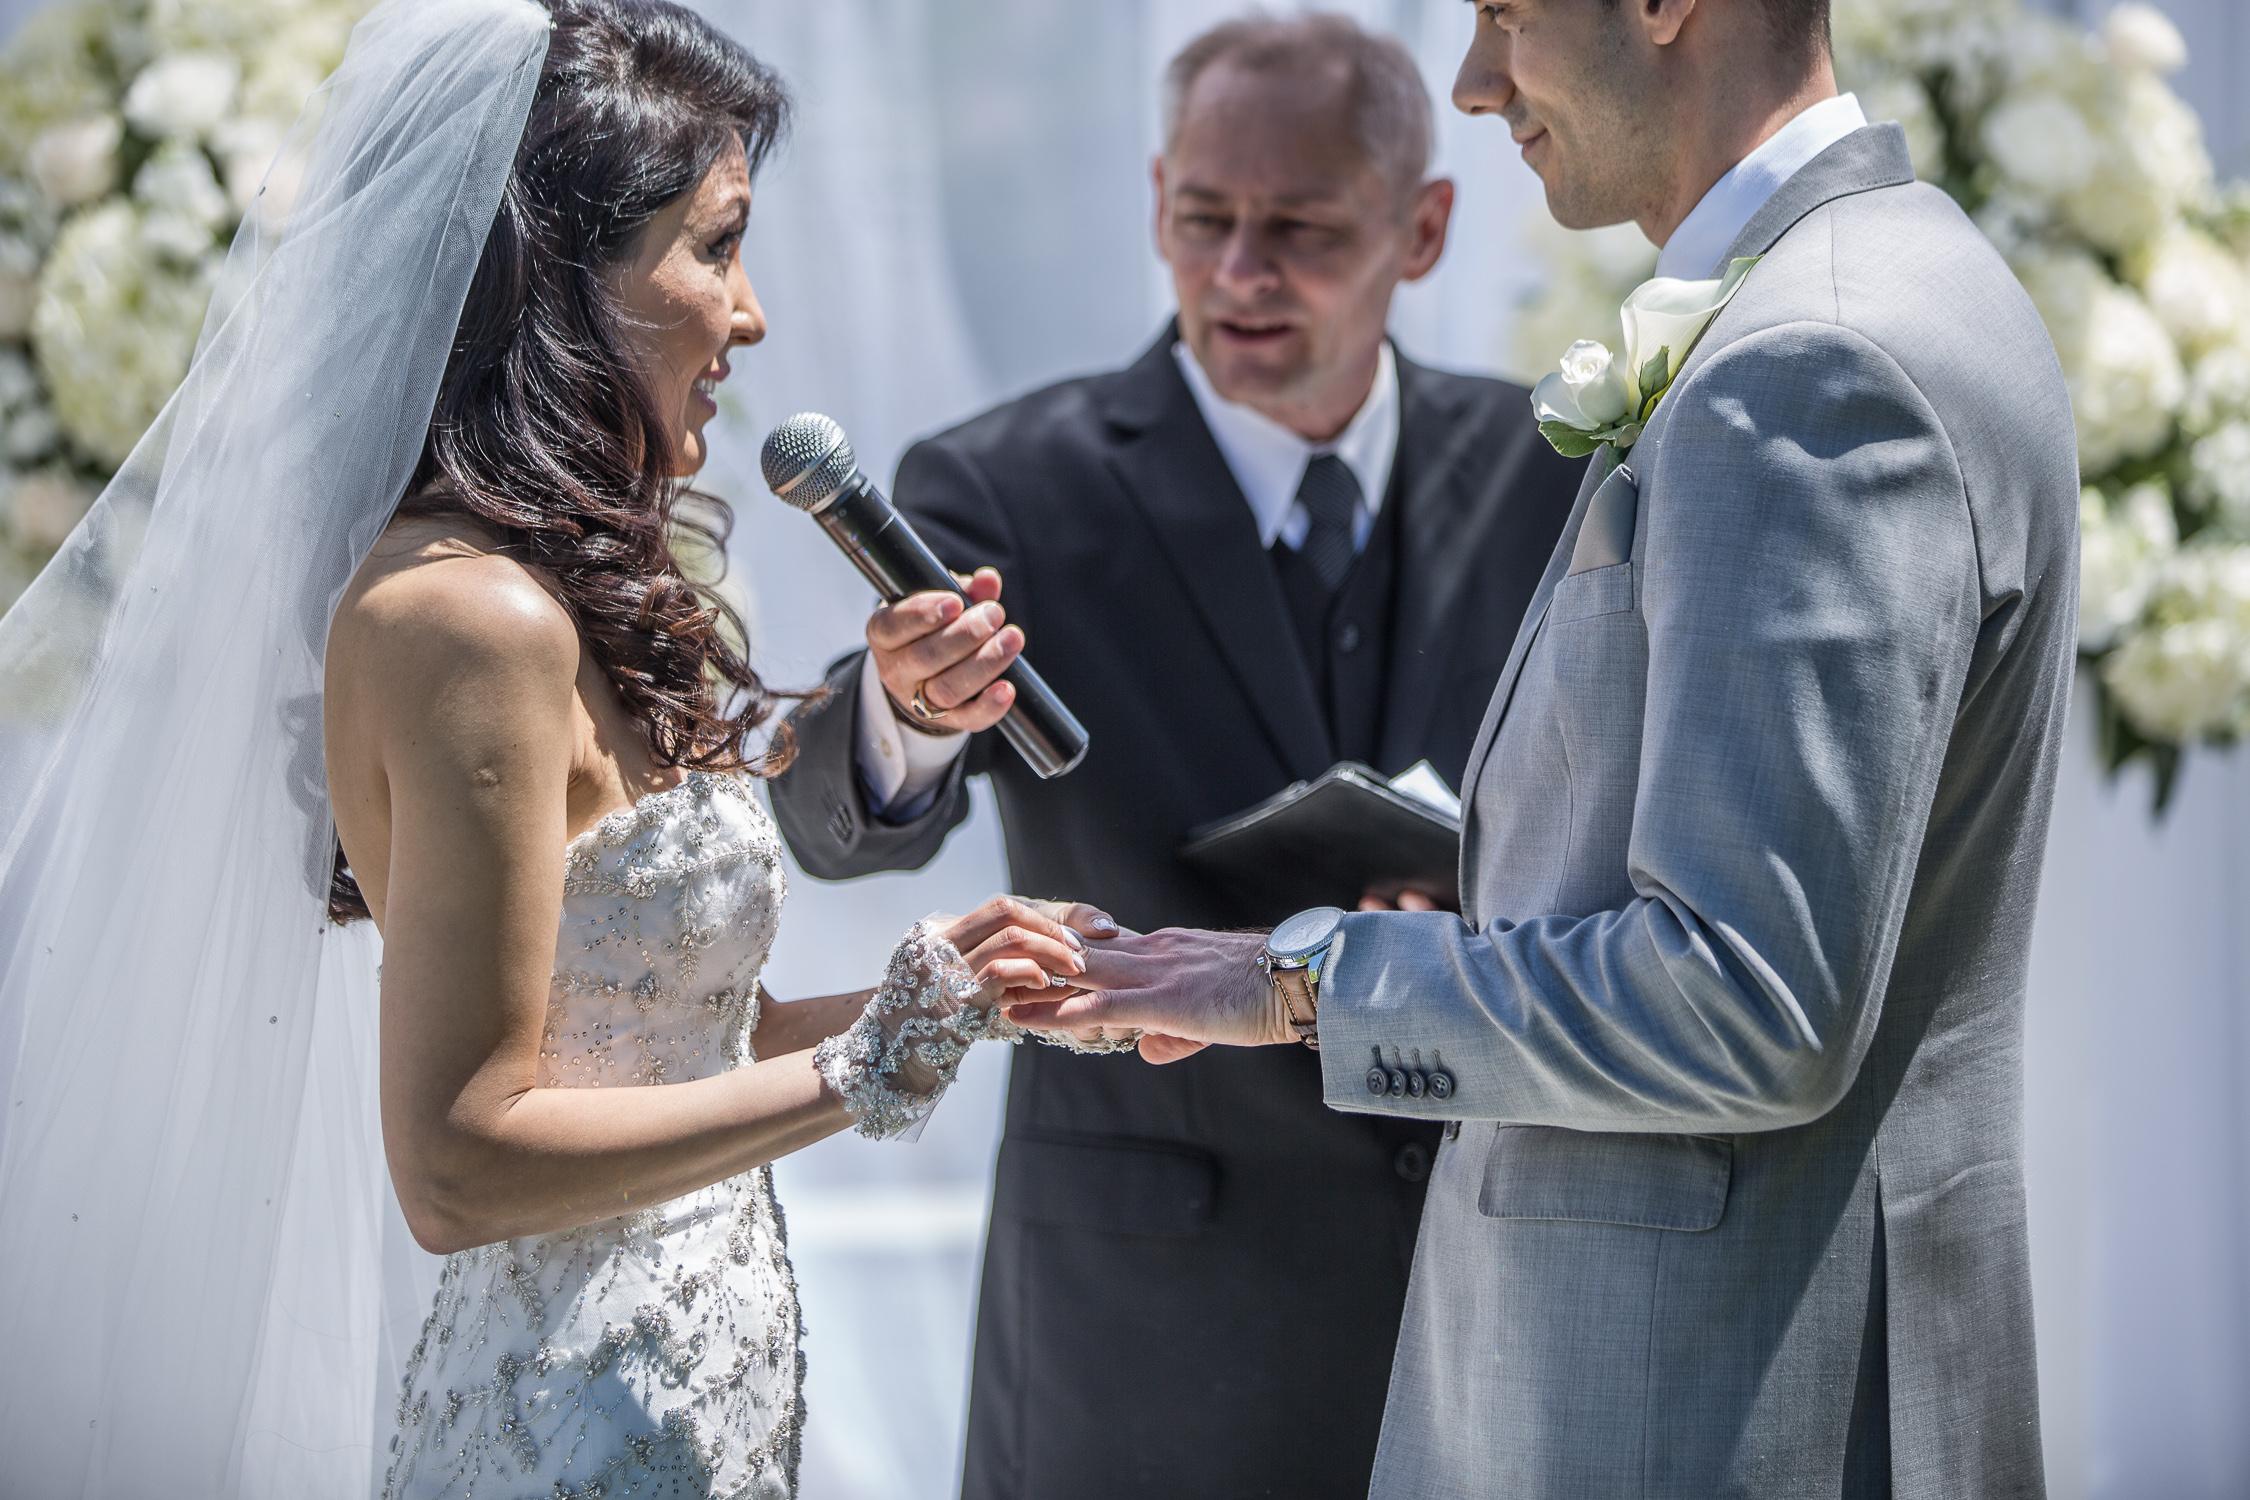 Paradise-Banquet-Hall-Wedding-Vaughan-Ontario-0046.jpg